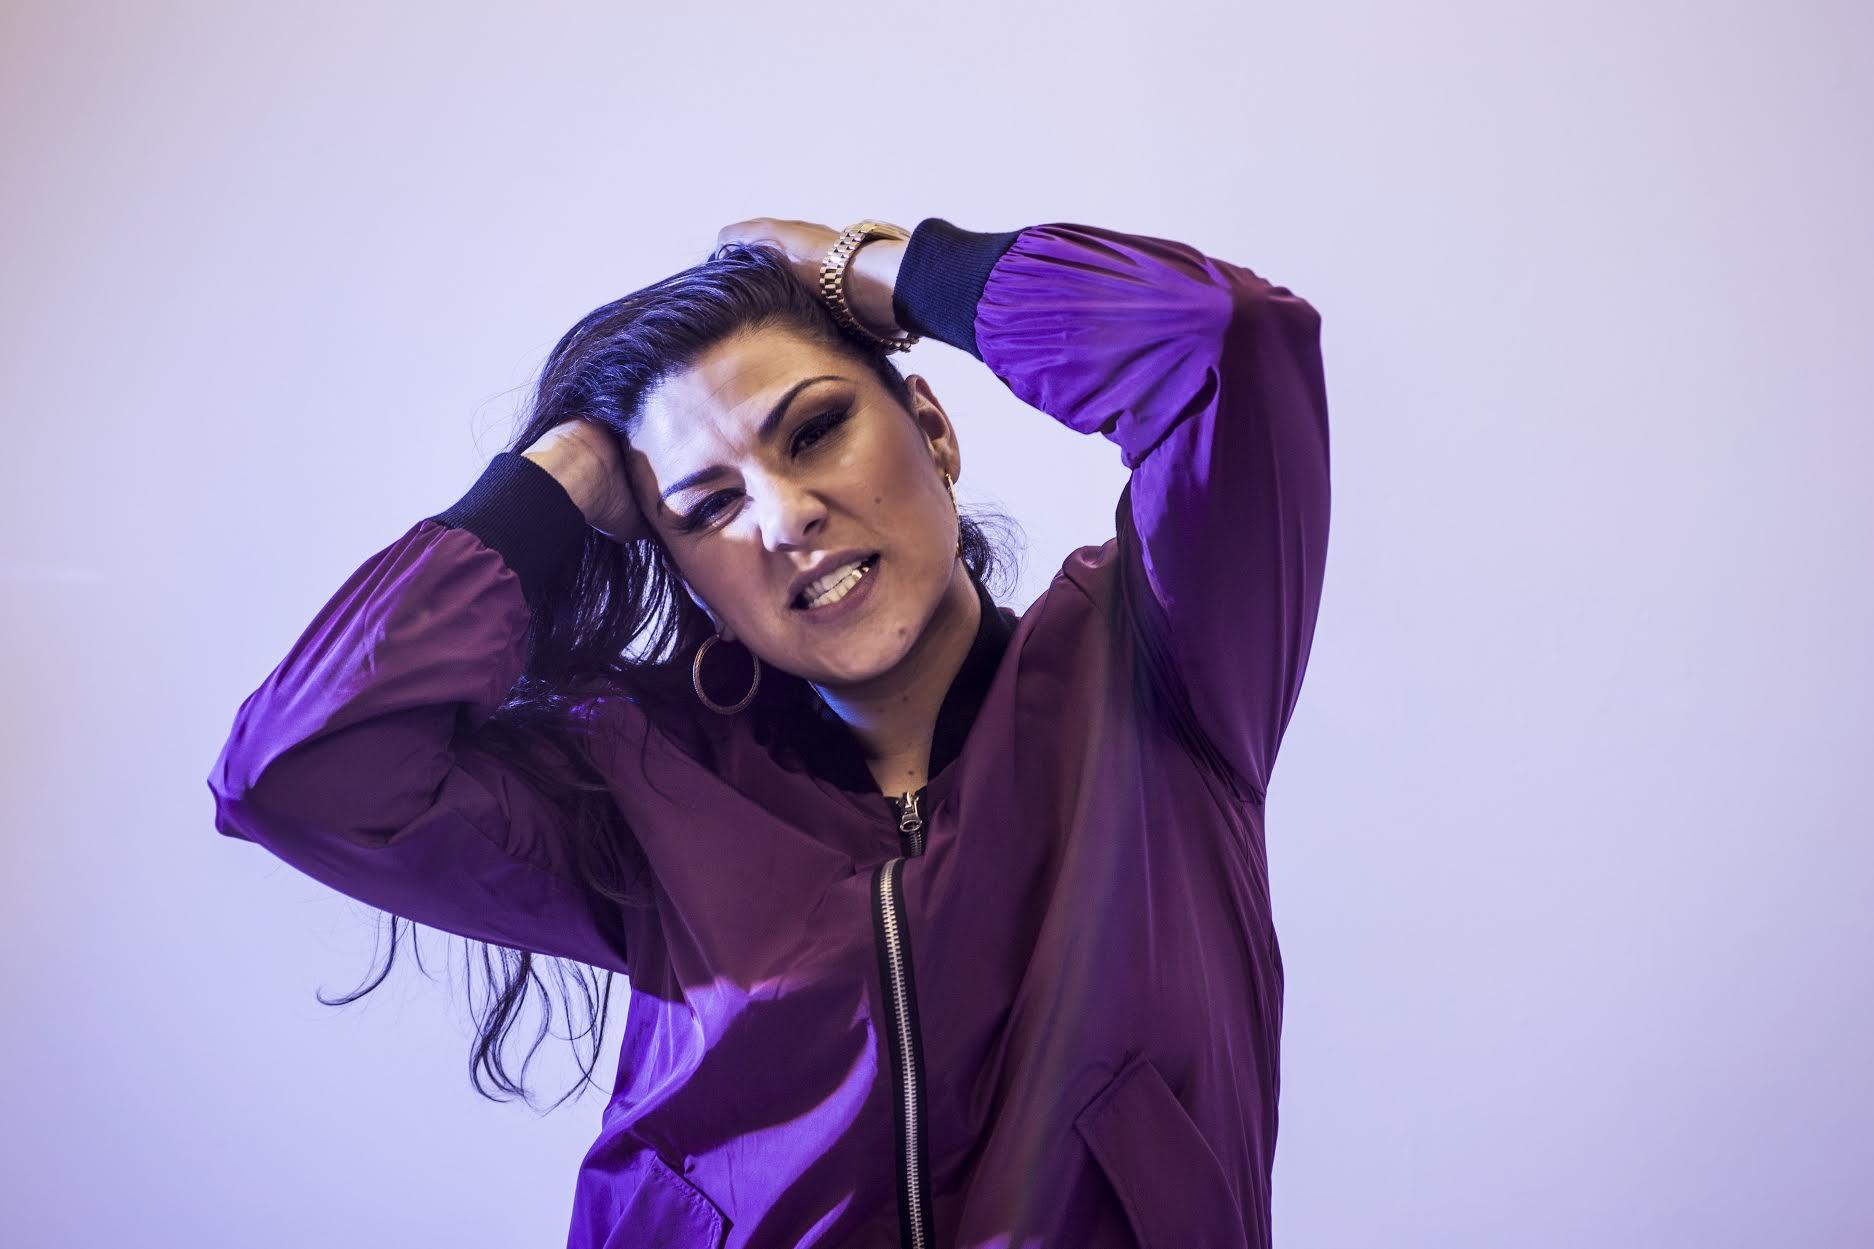 DJ Carisma - Photo by Uriel Sanchez Styled by LilFresh Sam